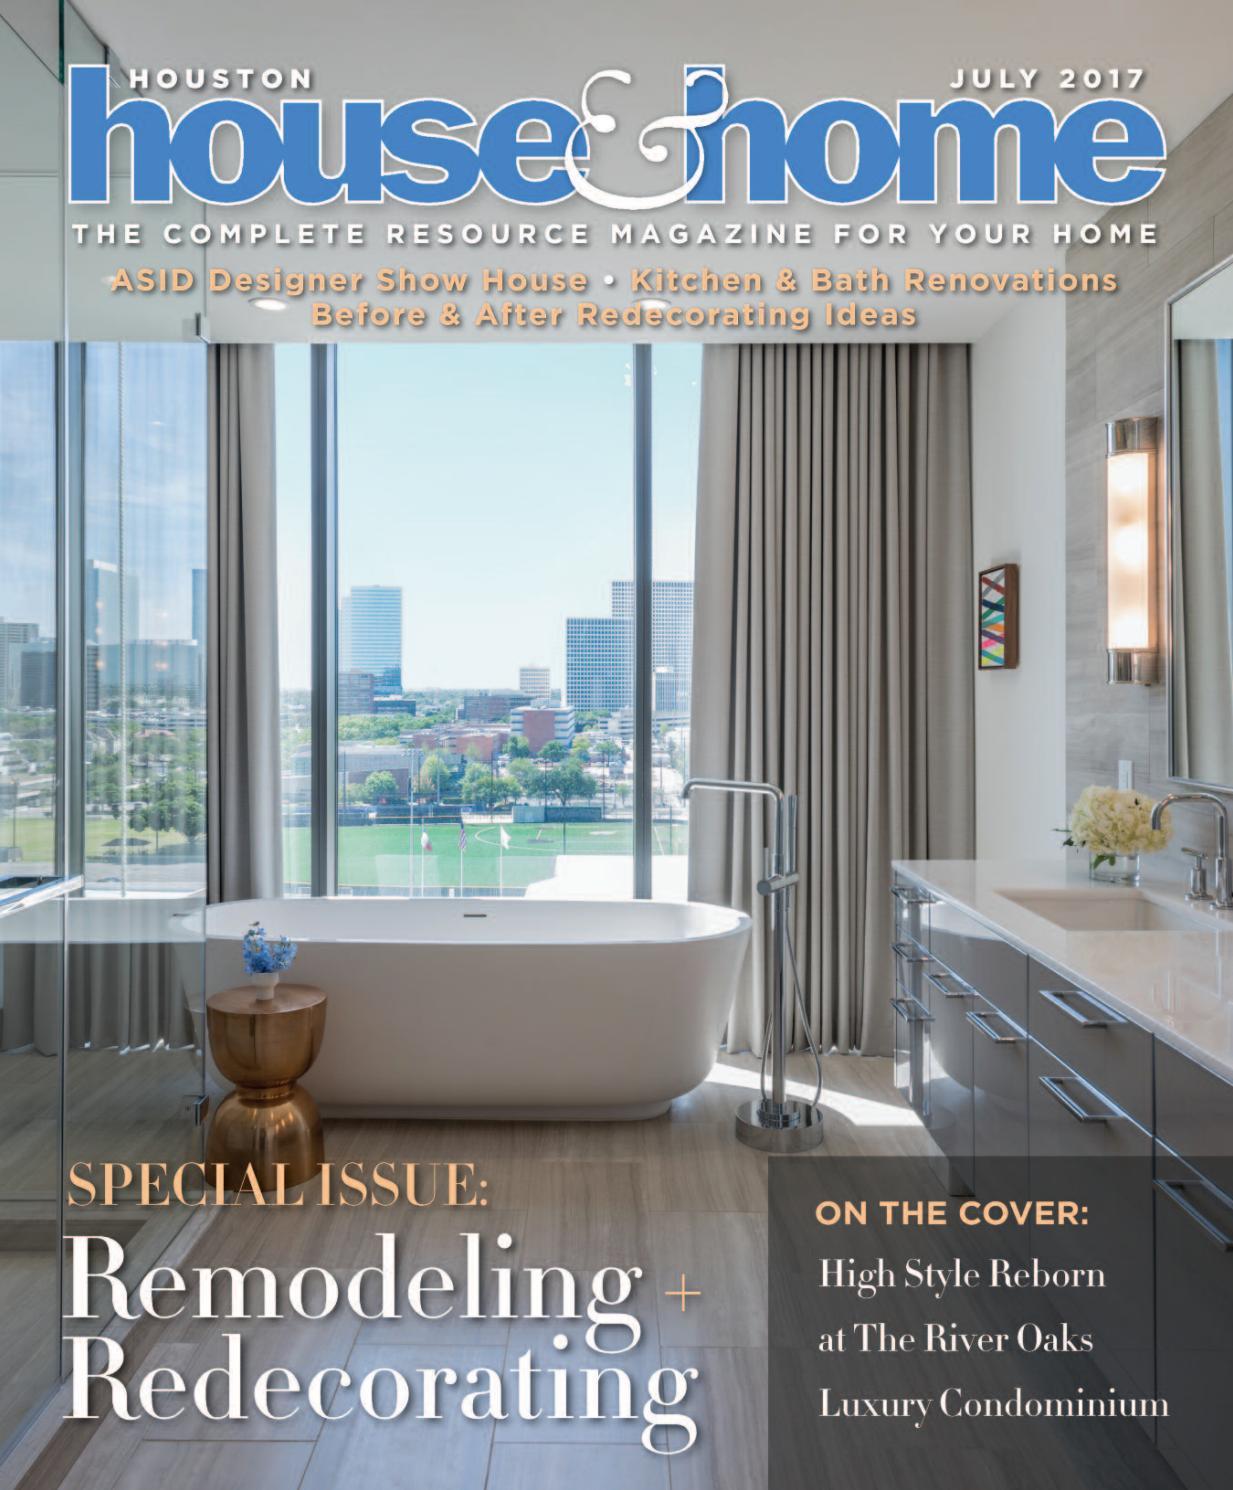 0717 houhousehome vir by Houston House & Home Magazine - issuu